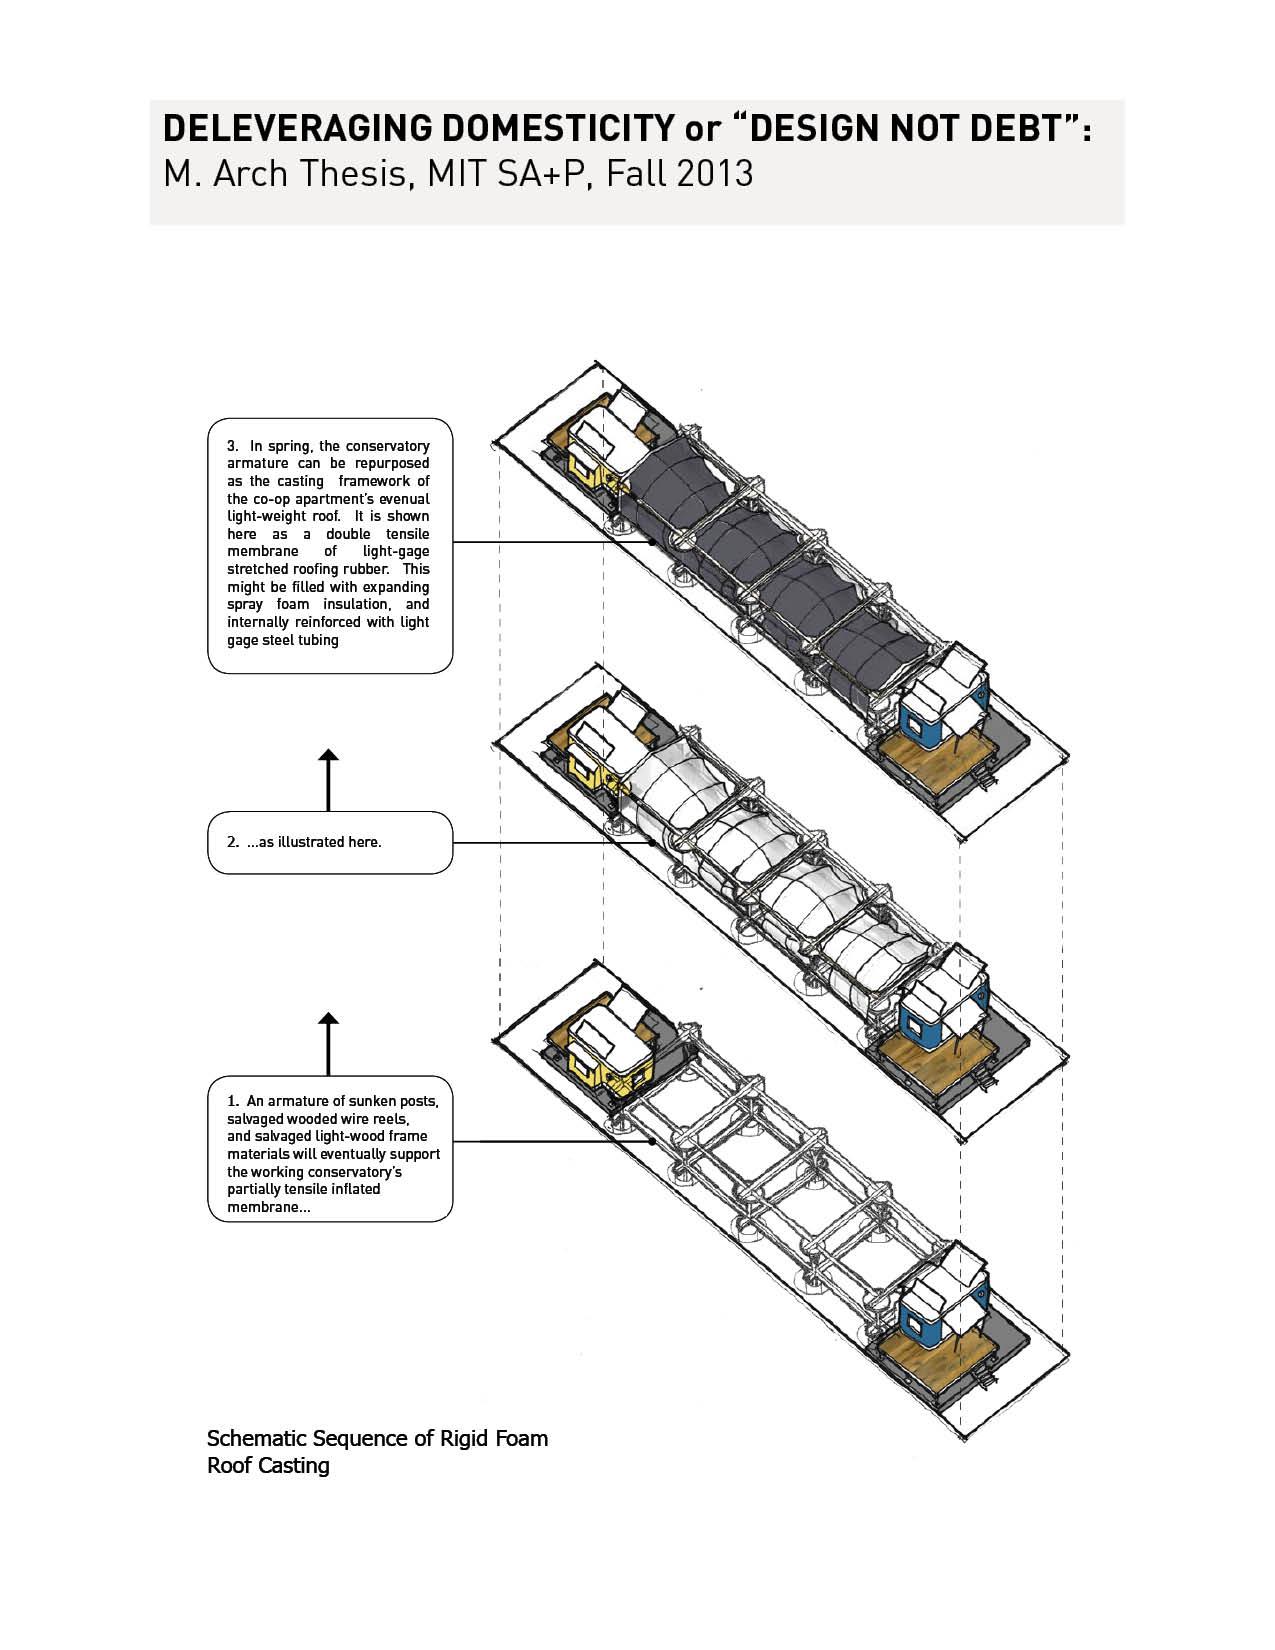 MIT_thesis10.jpg